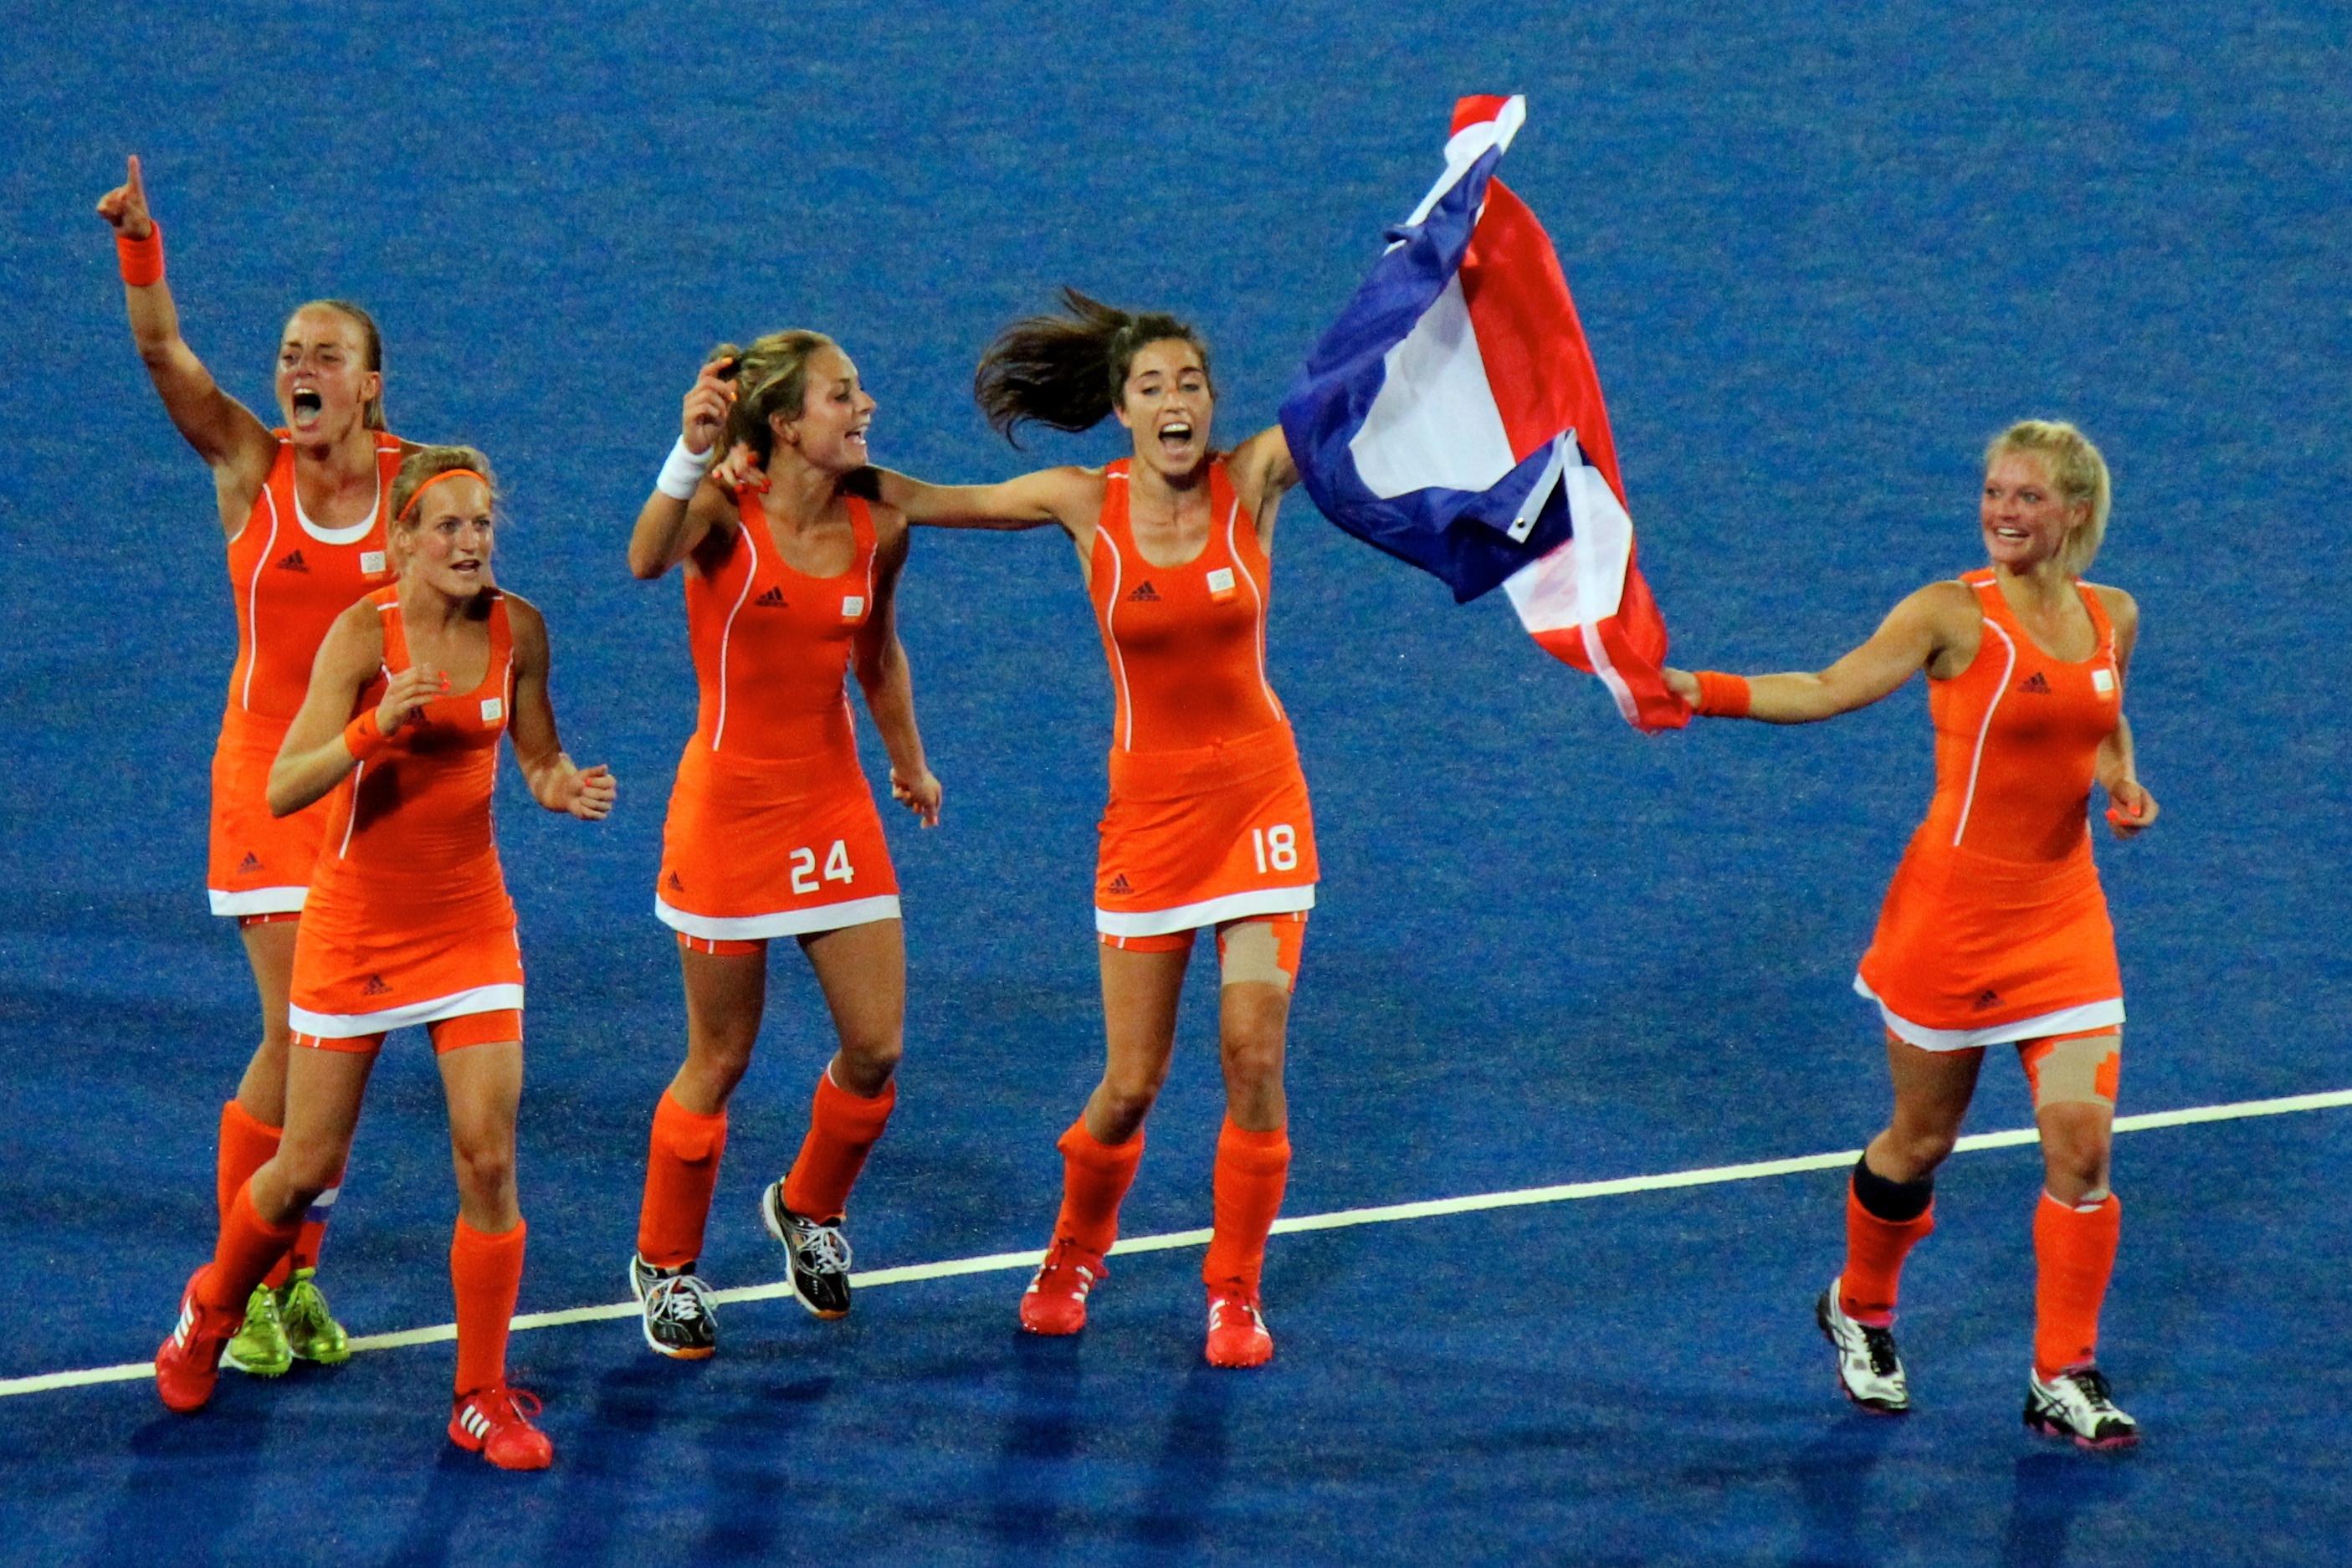 Netherlands women's national field hockey team